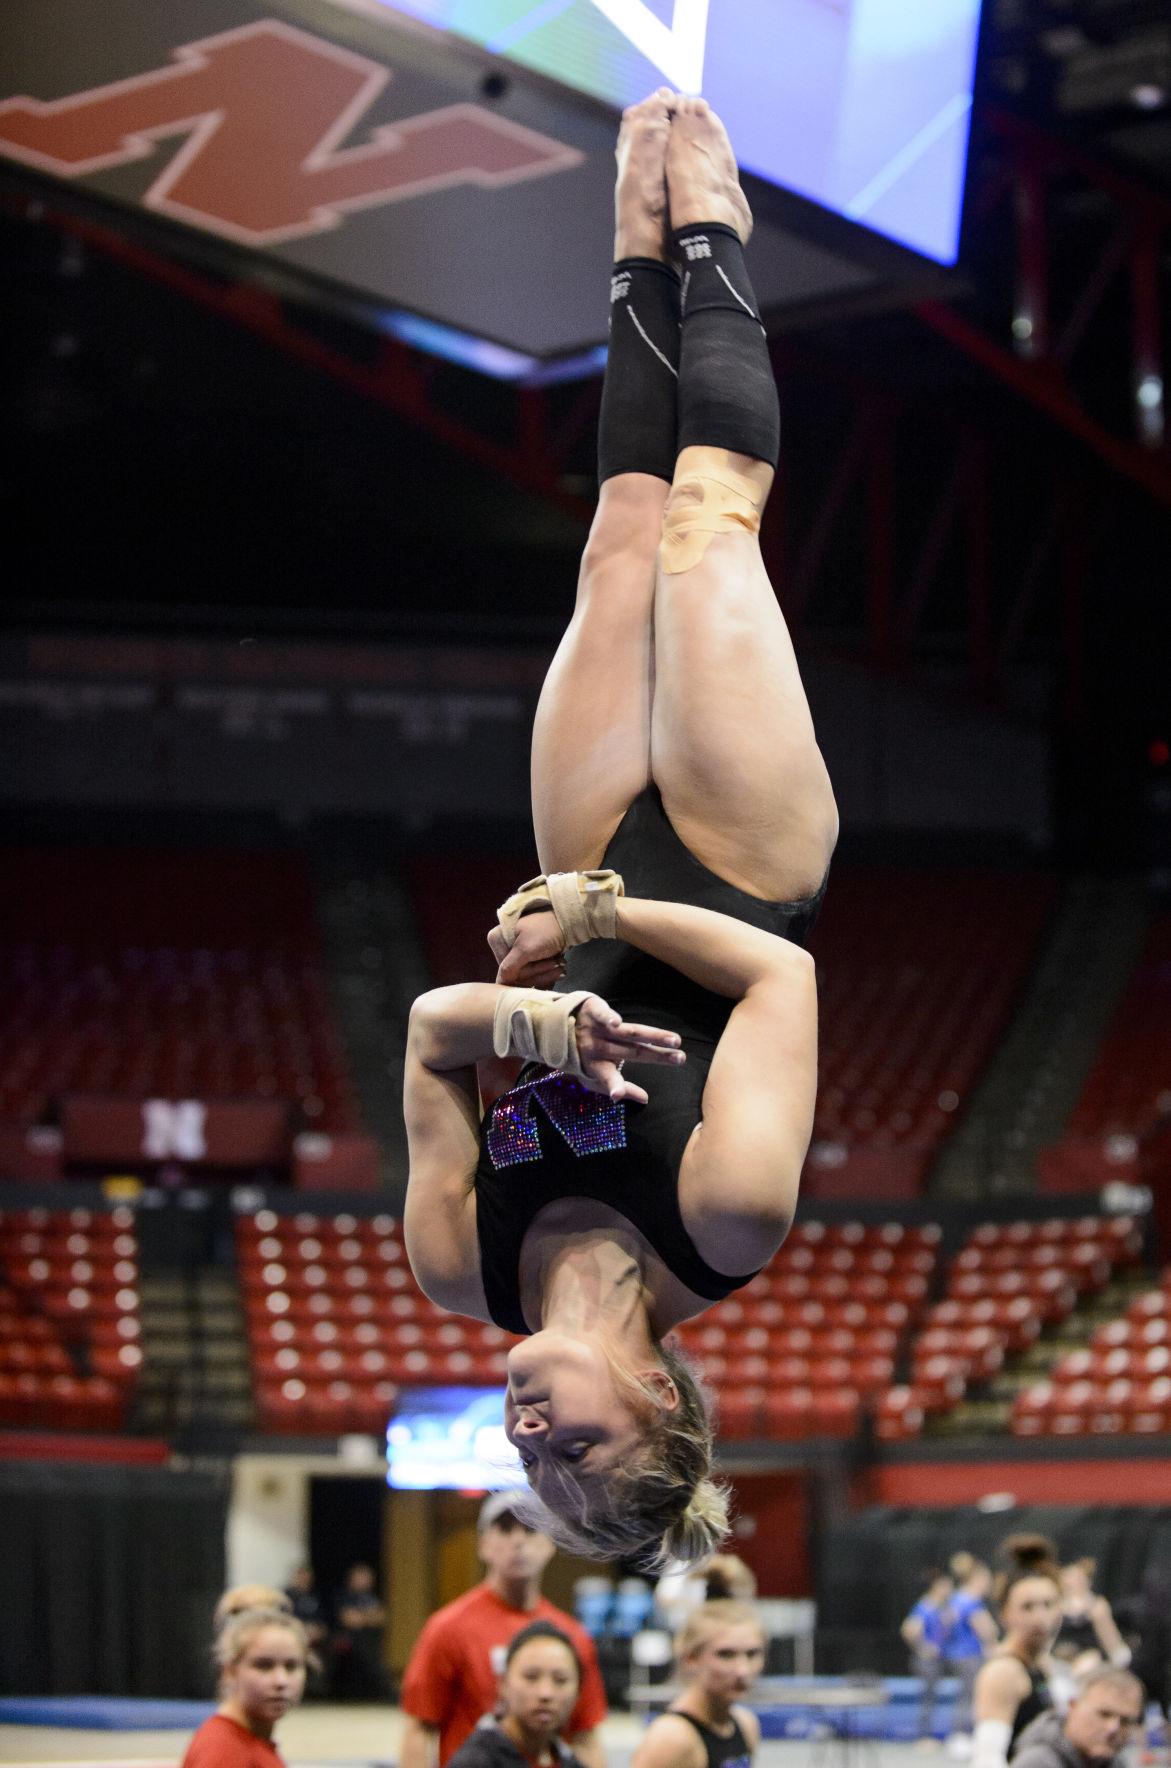 NCAA Gymnastics Practice, 3/31/17